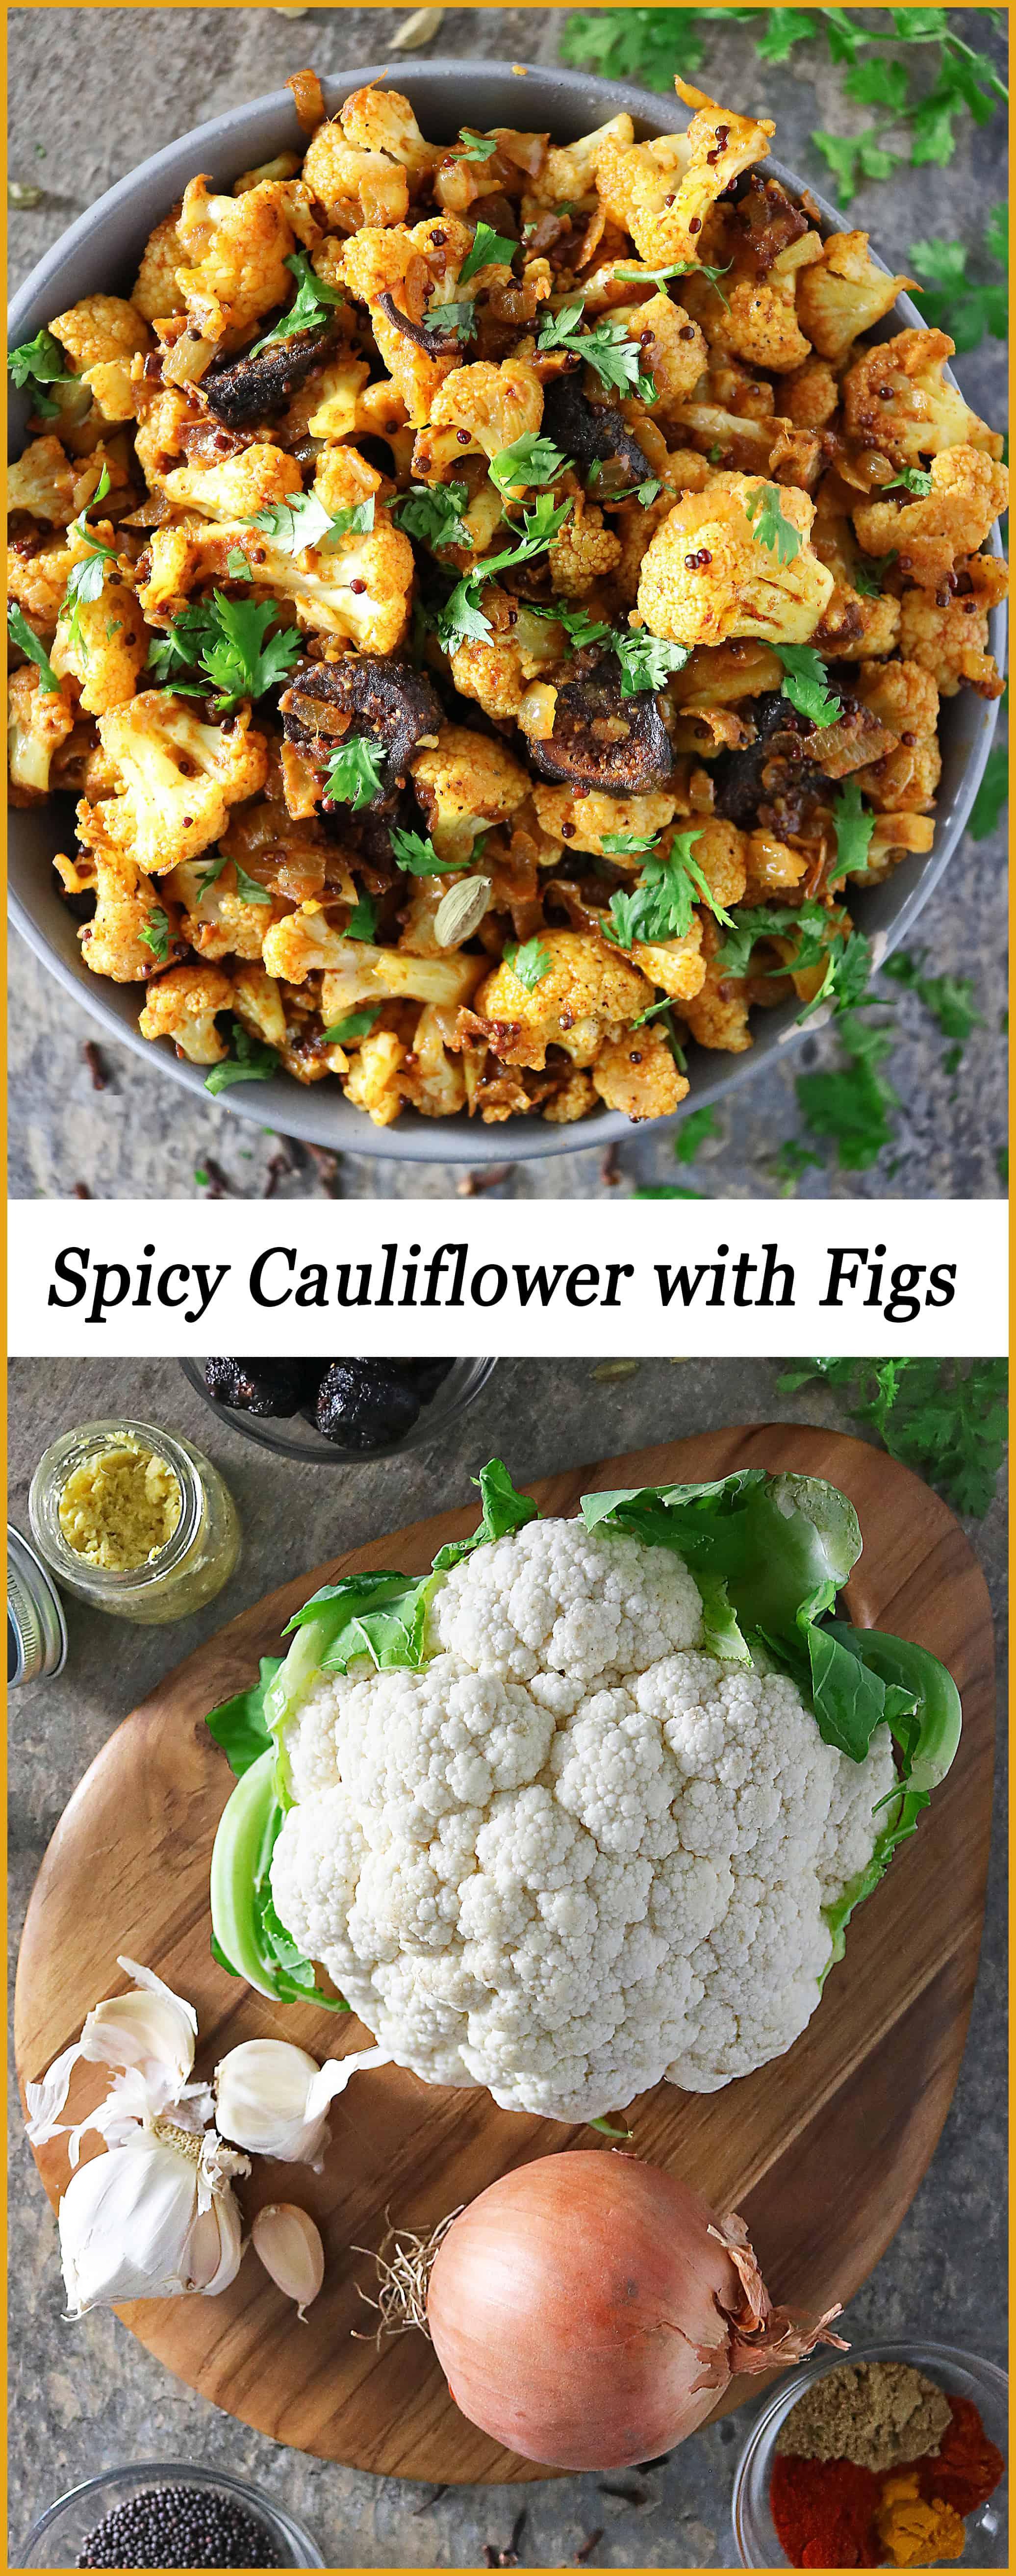 Spicy Cauliflower with Figs